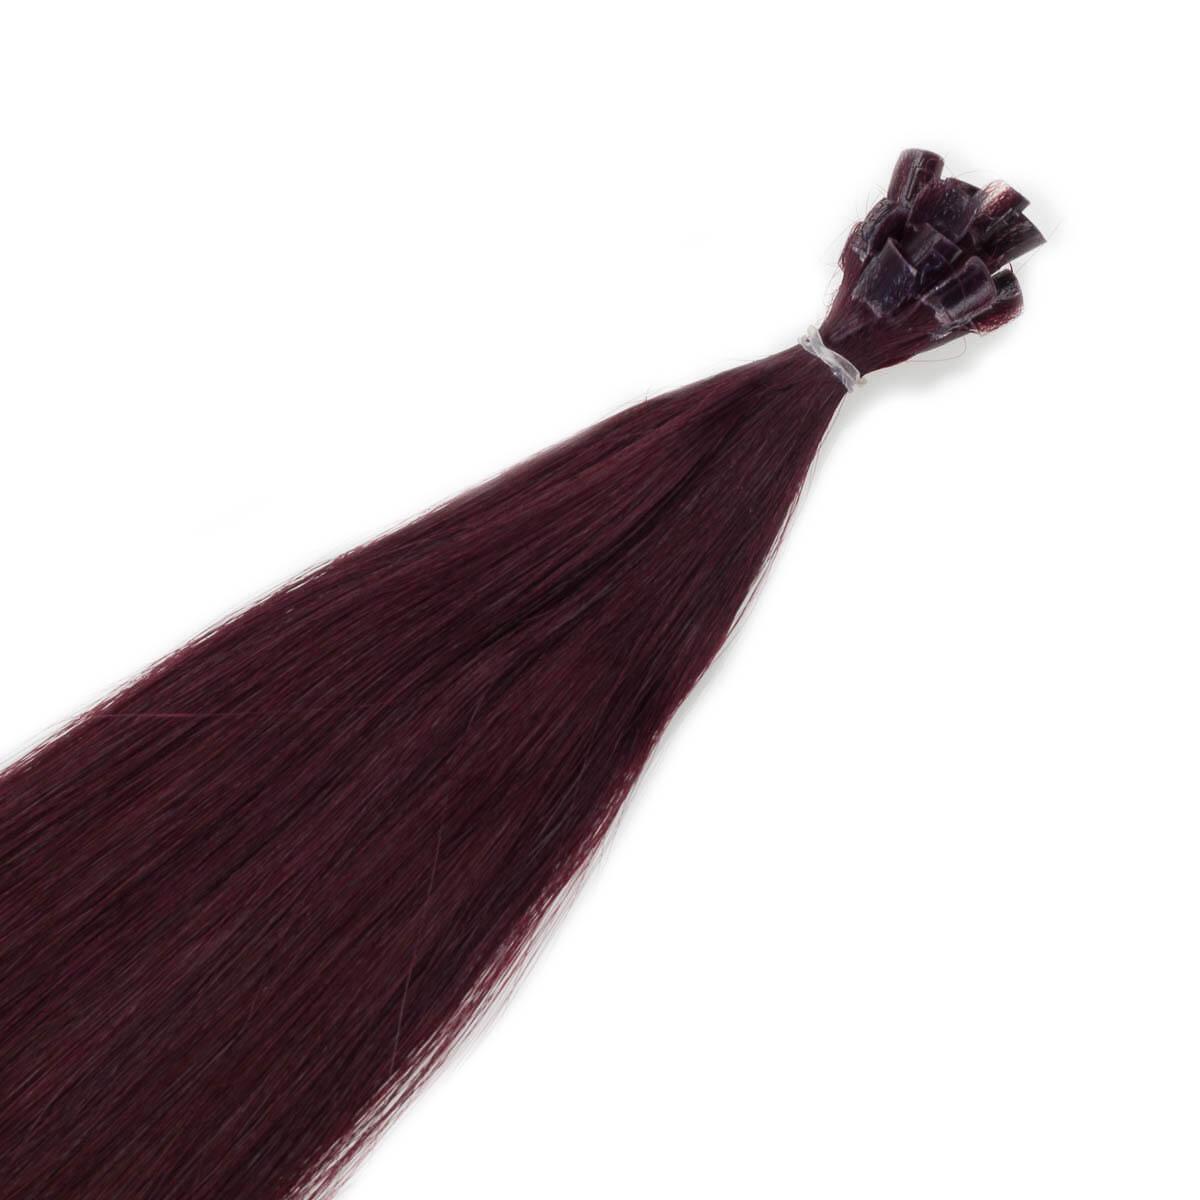 Nail Hair Original 6.12 Dark Mahogany Brown 50 cm